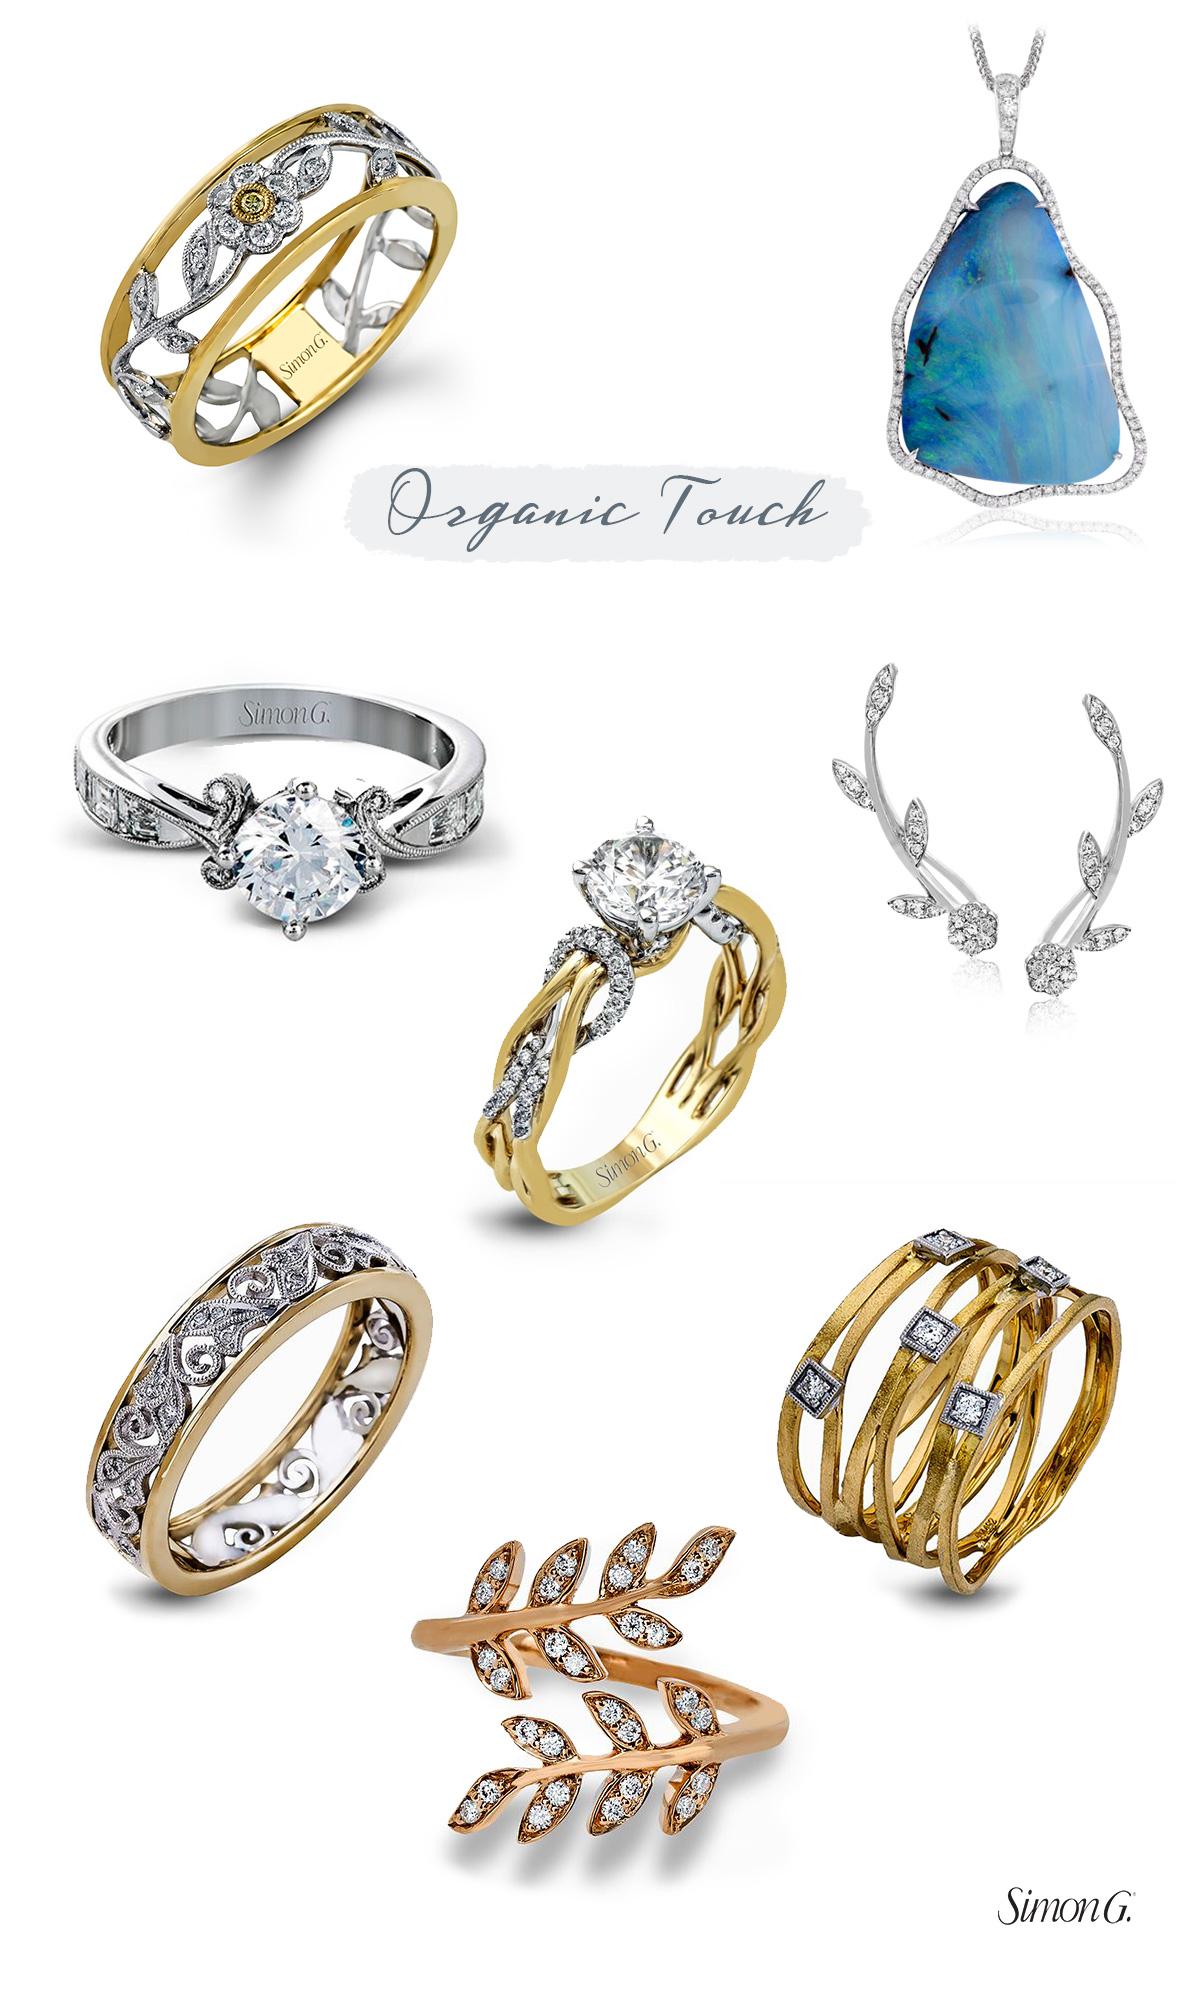 simon g jewelry 2017 trends engagement rings organic designs diamond halo e ring